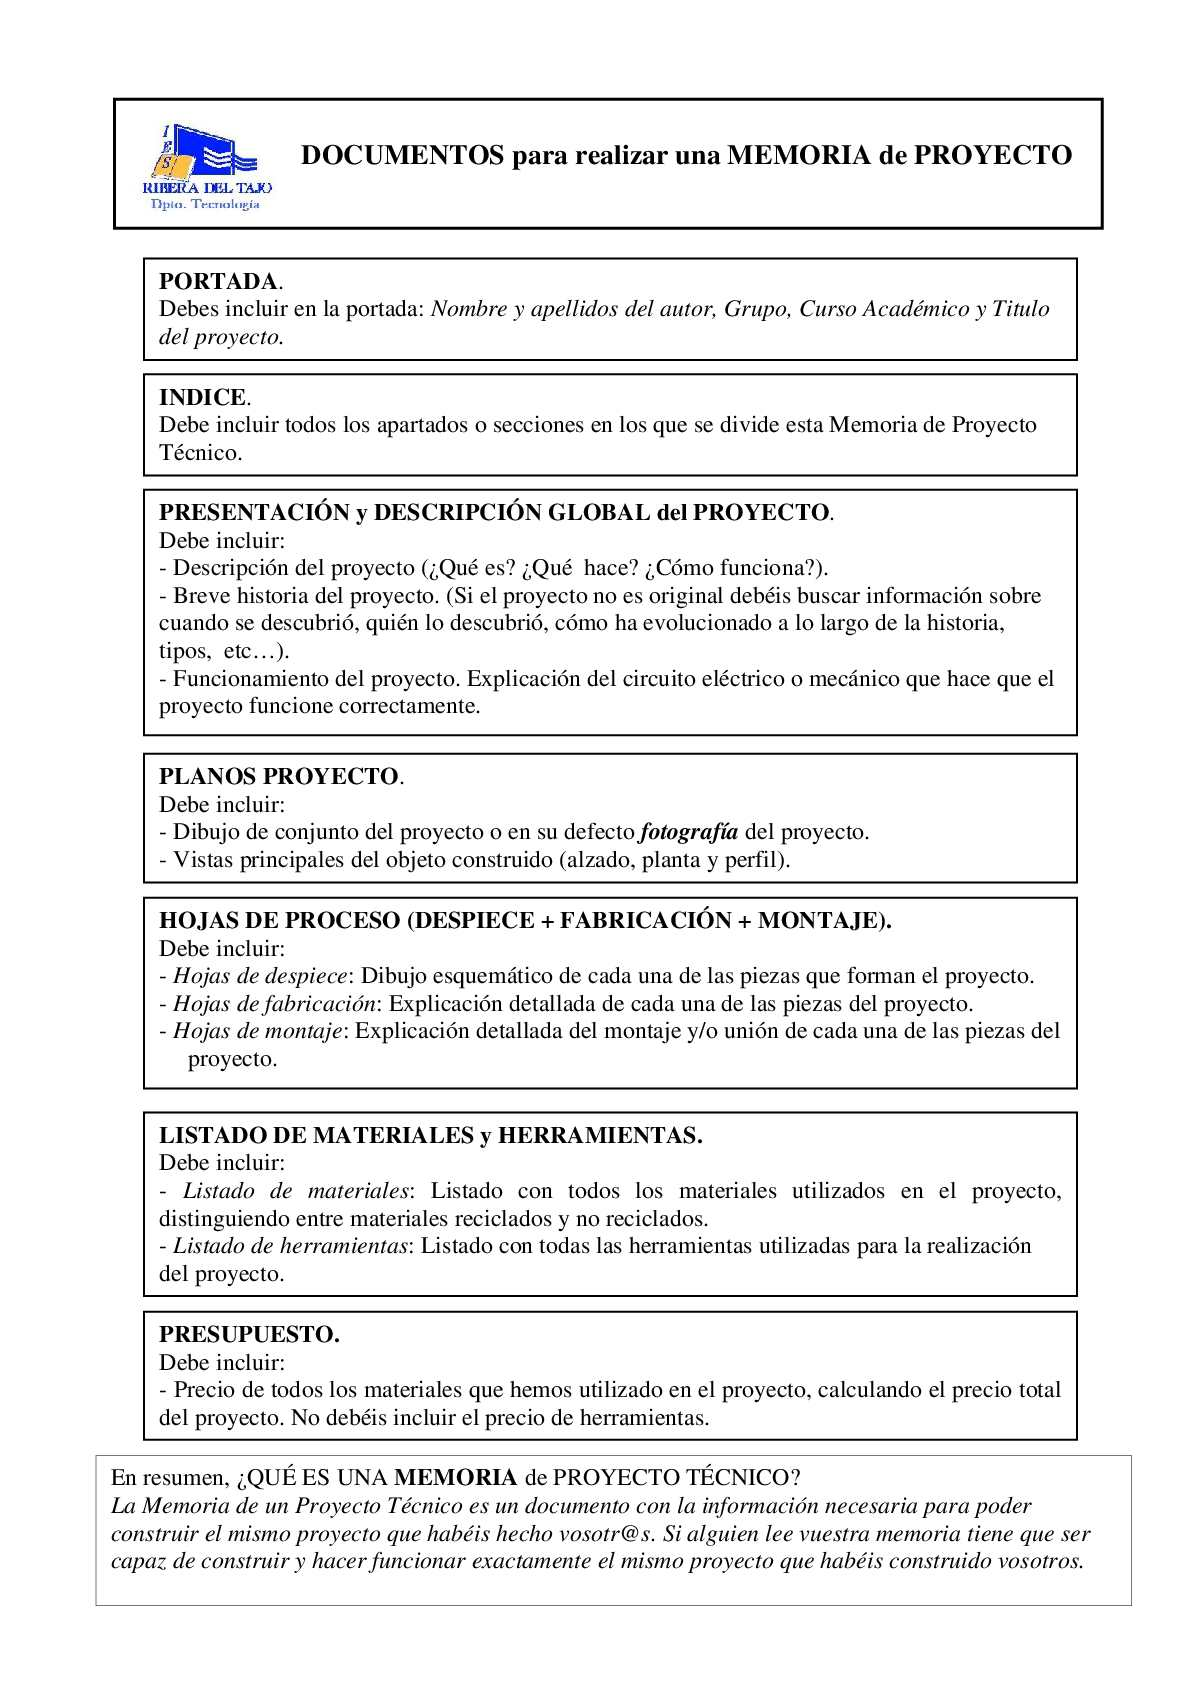 Calaméo - Resumen Memoria Proyecto Tecnico